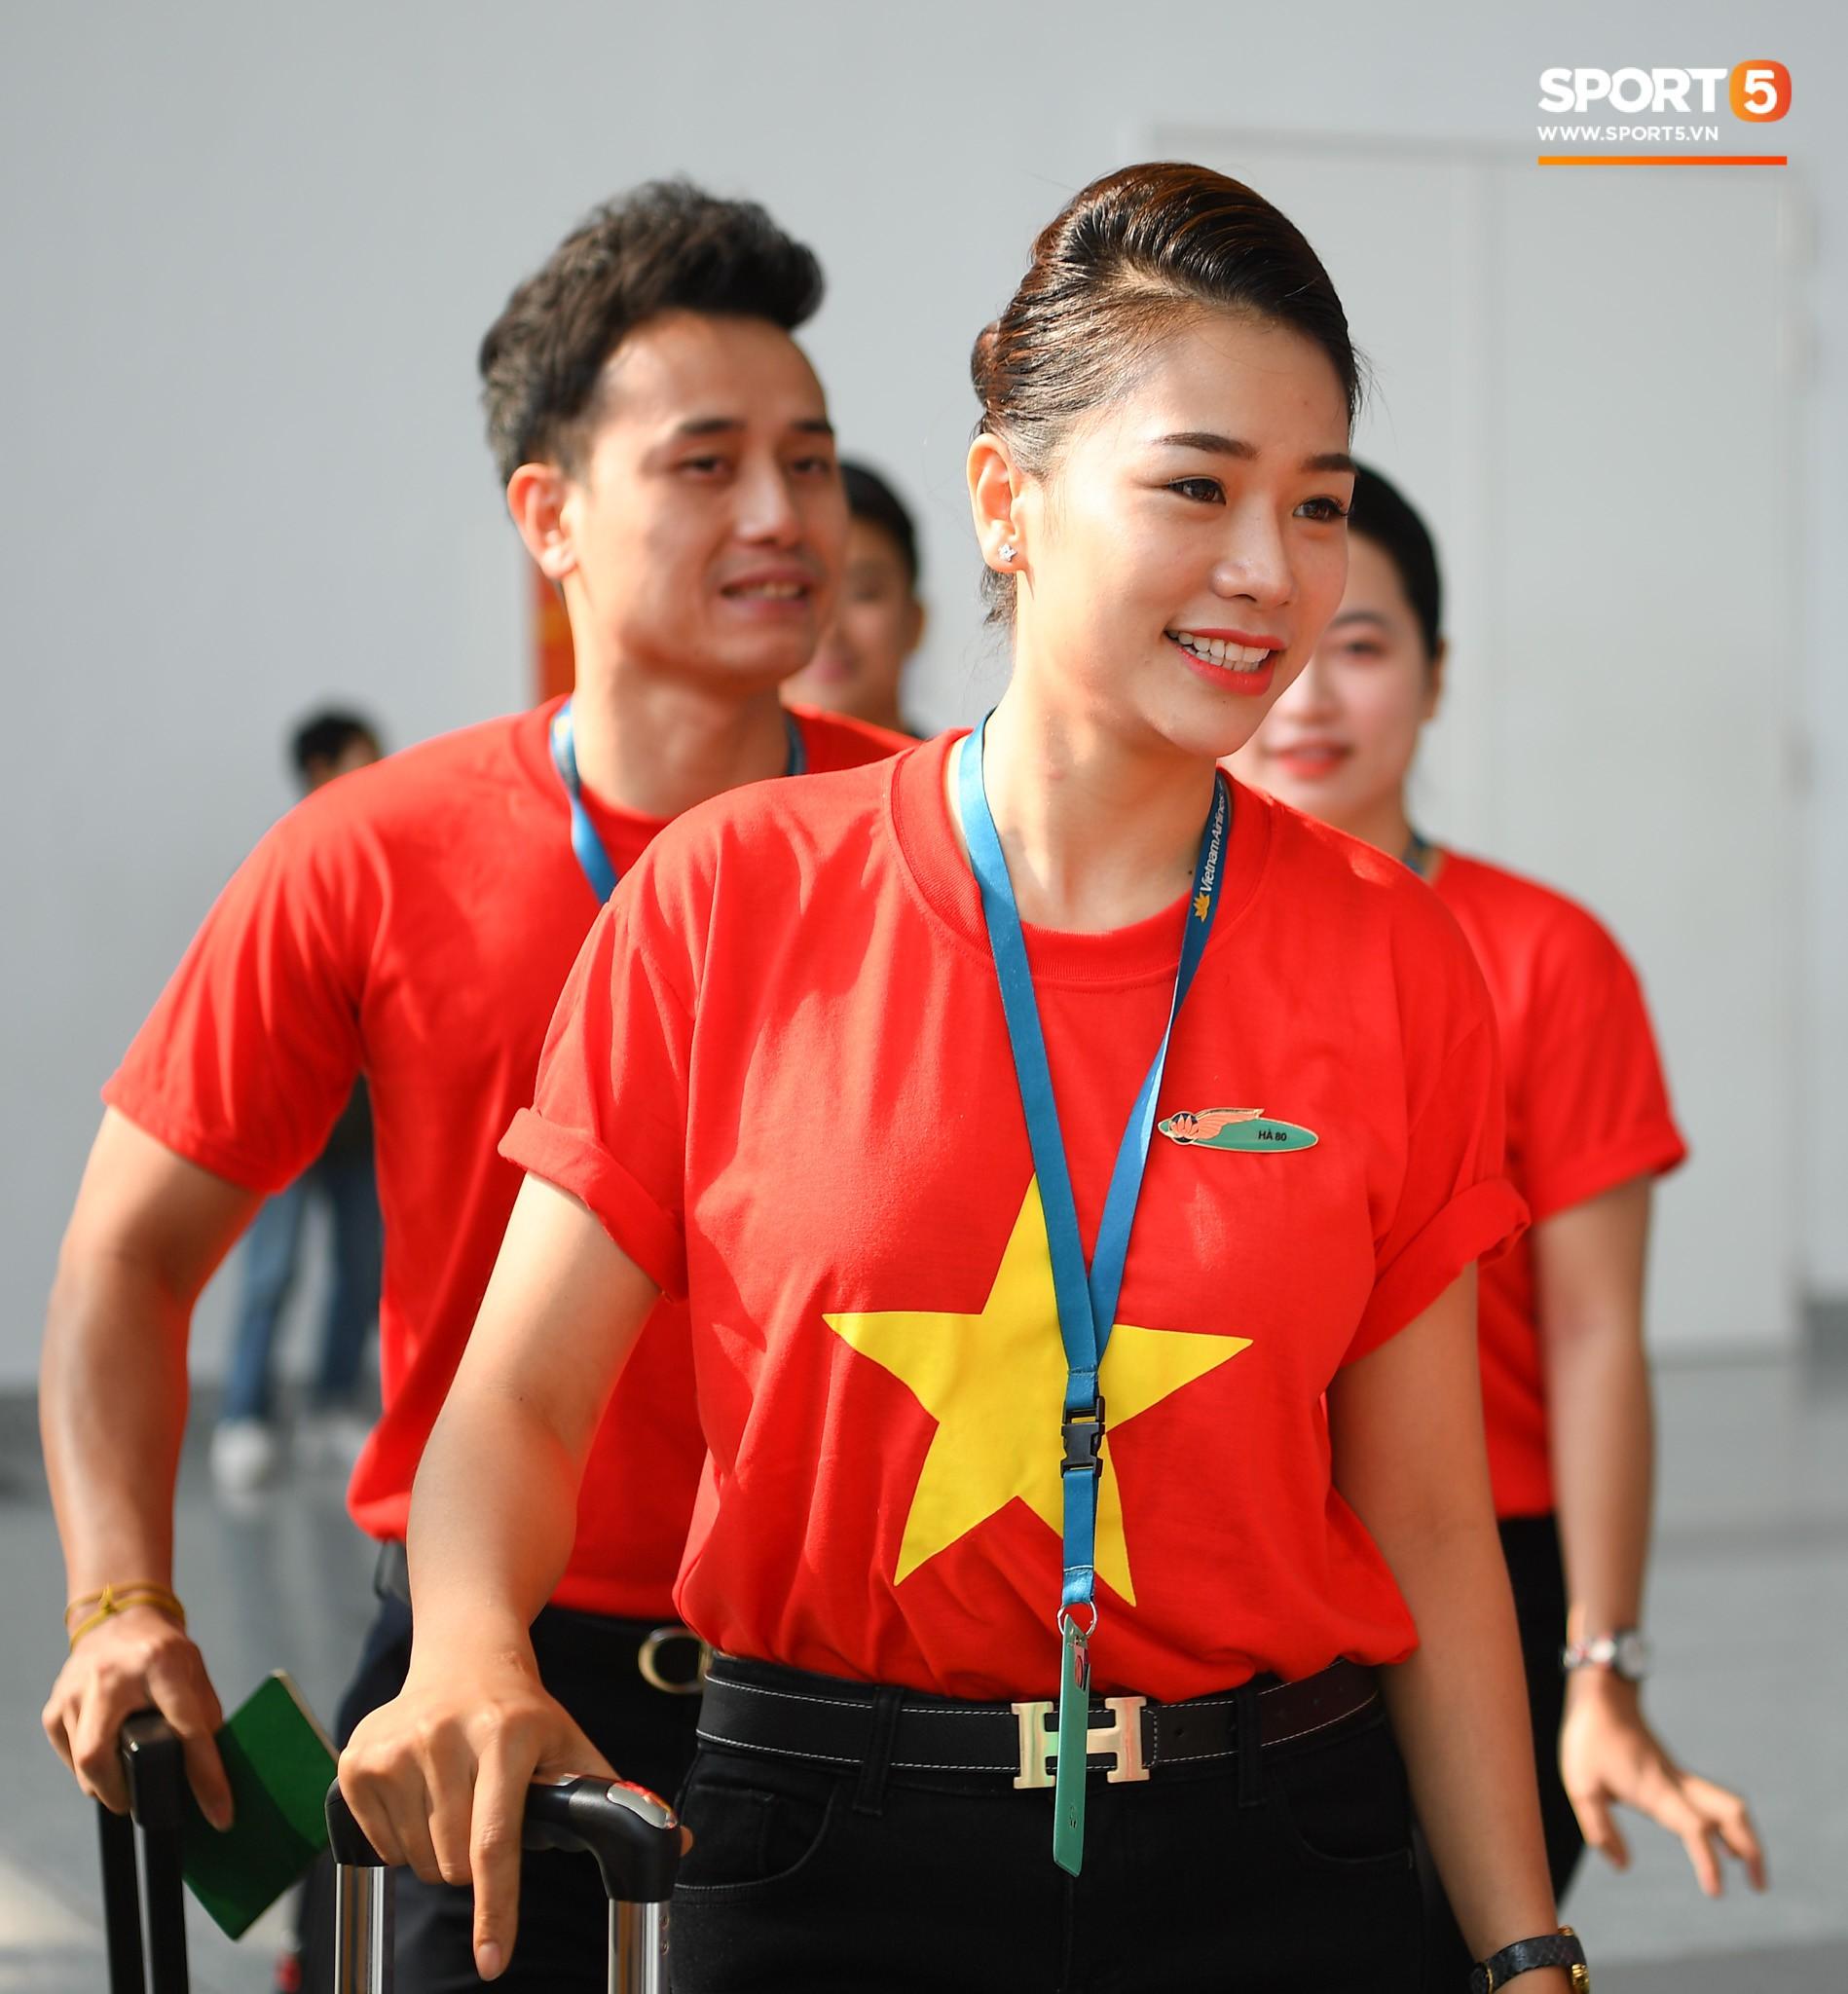 vietnamdiphilippines28112018415433757584841037287450de0ccad611cp.jpg